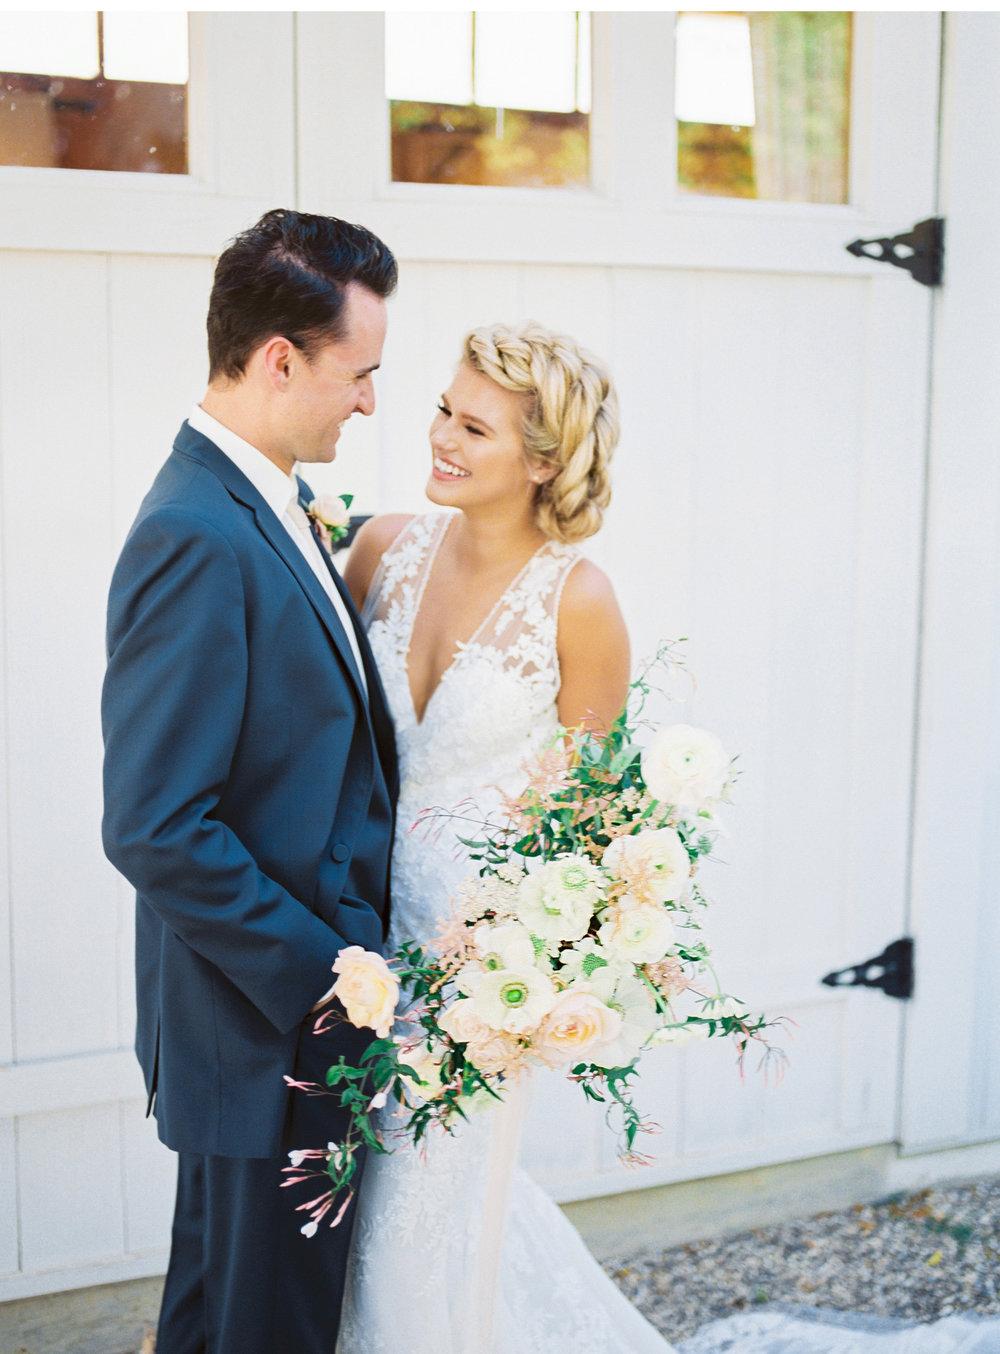 San-Luis-Obispo-Weddings-Natalie-Schutt-Wedding-Photography_13.jpg